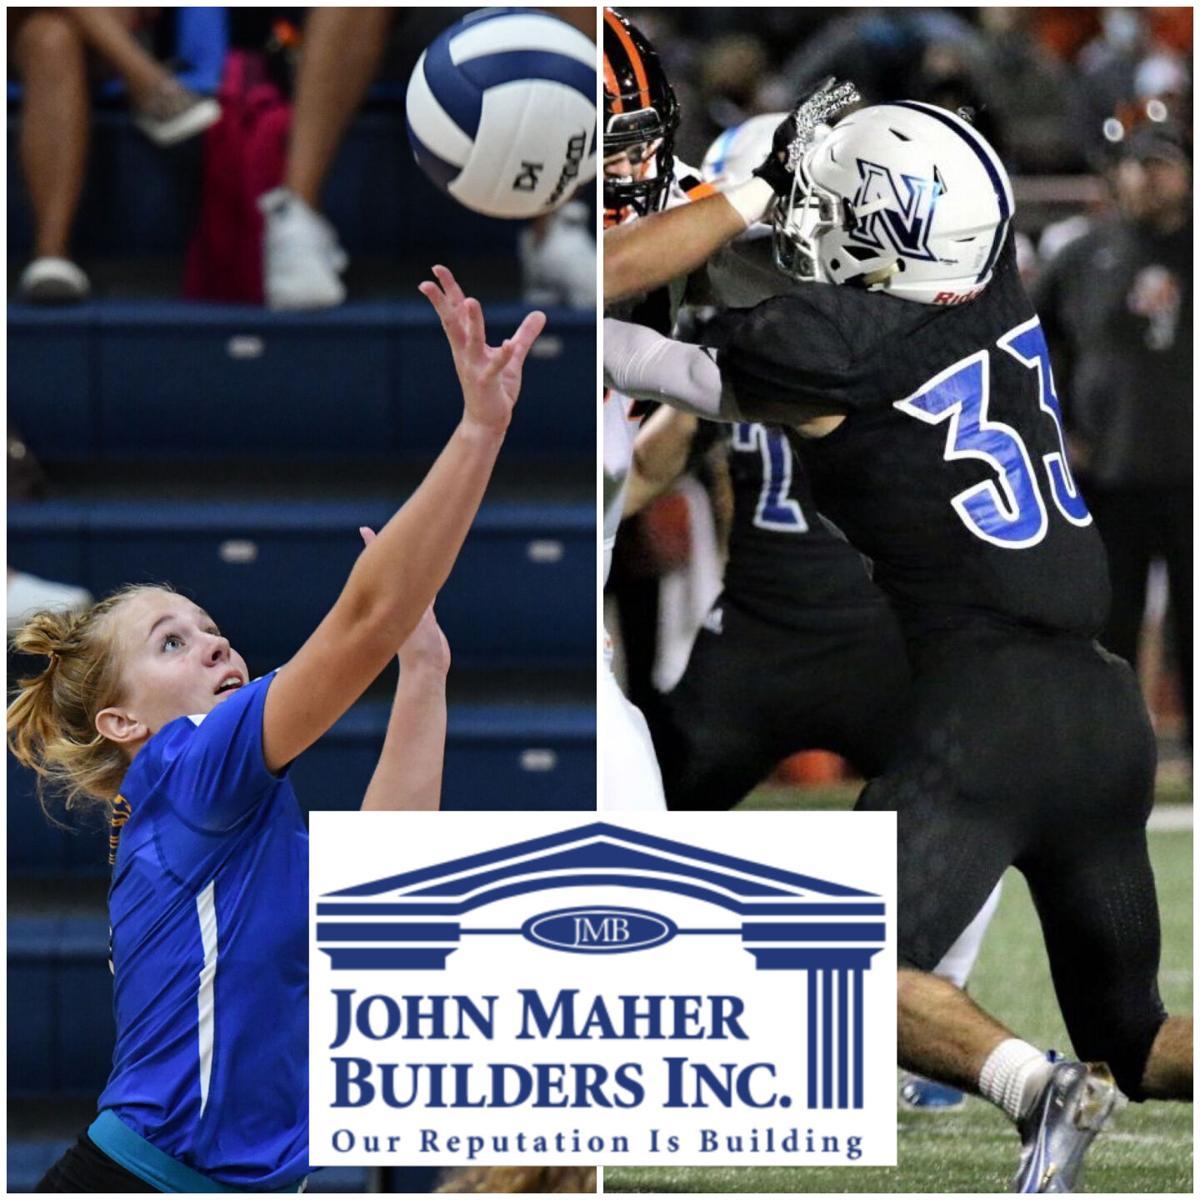 John Maher Builders Scholar Athletes